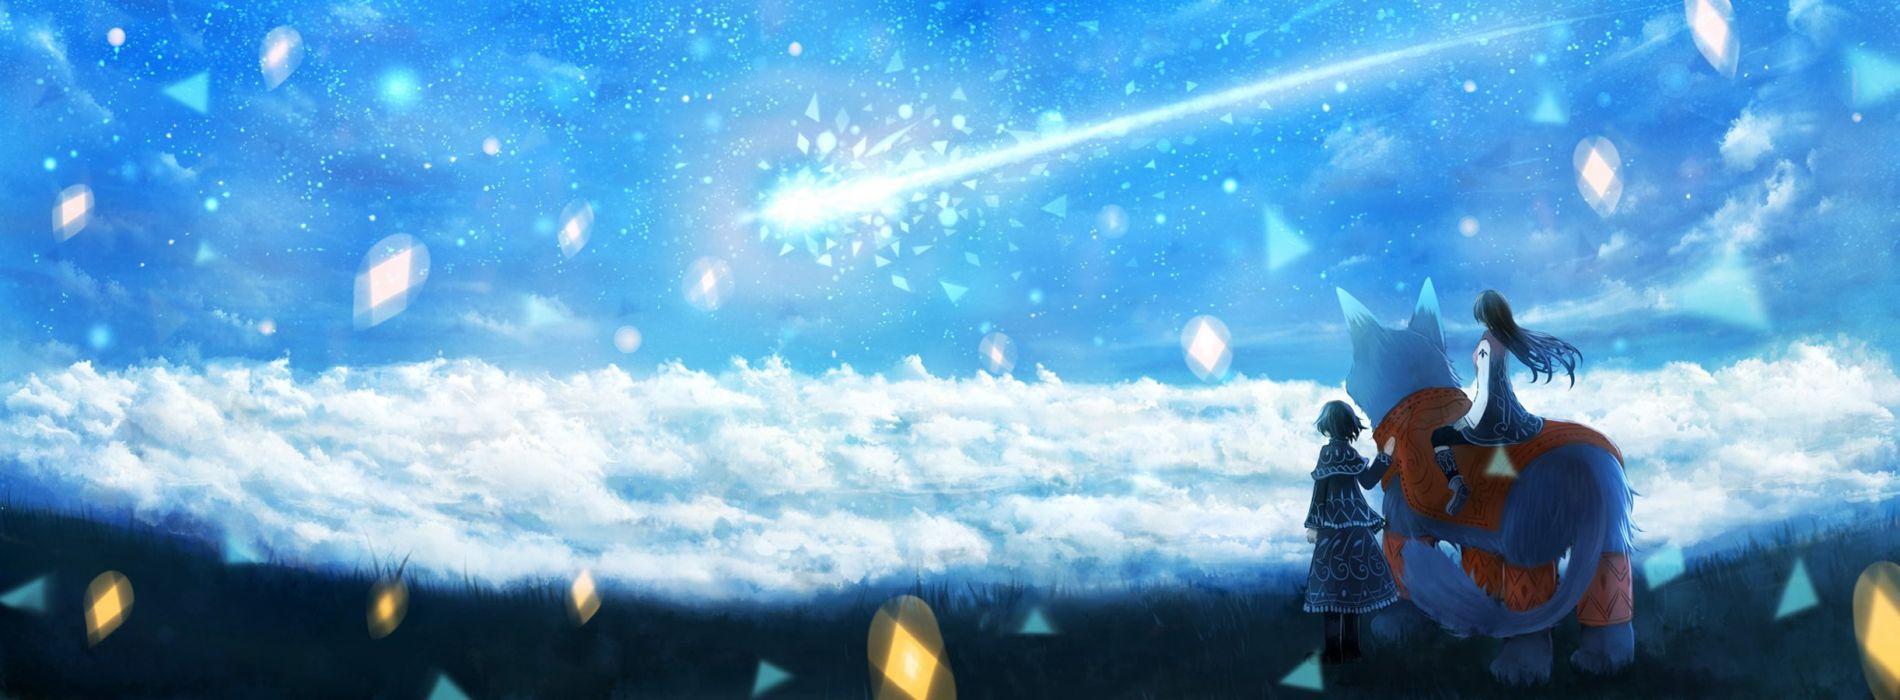 dress landscape sky girl wallpaper